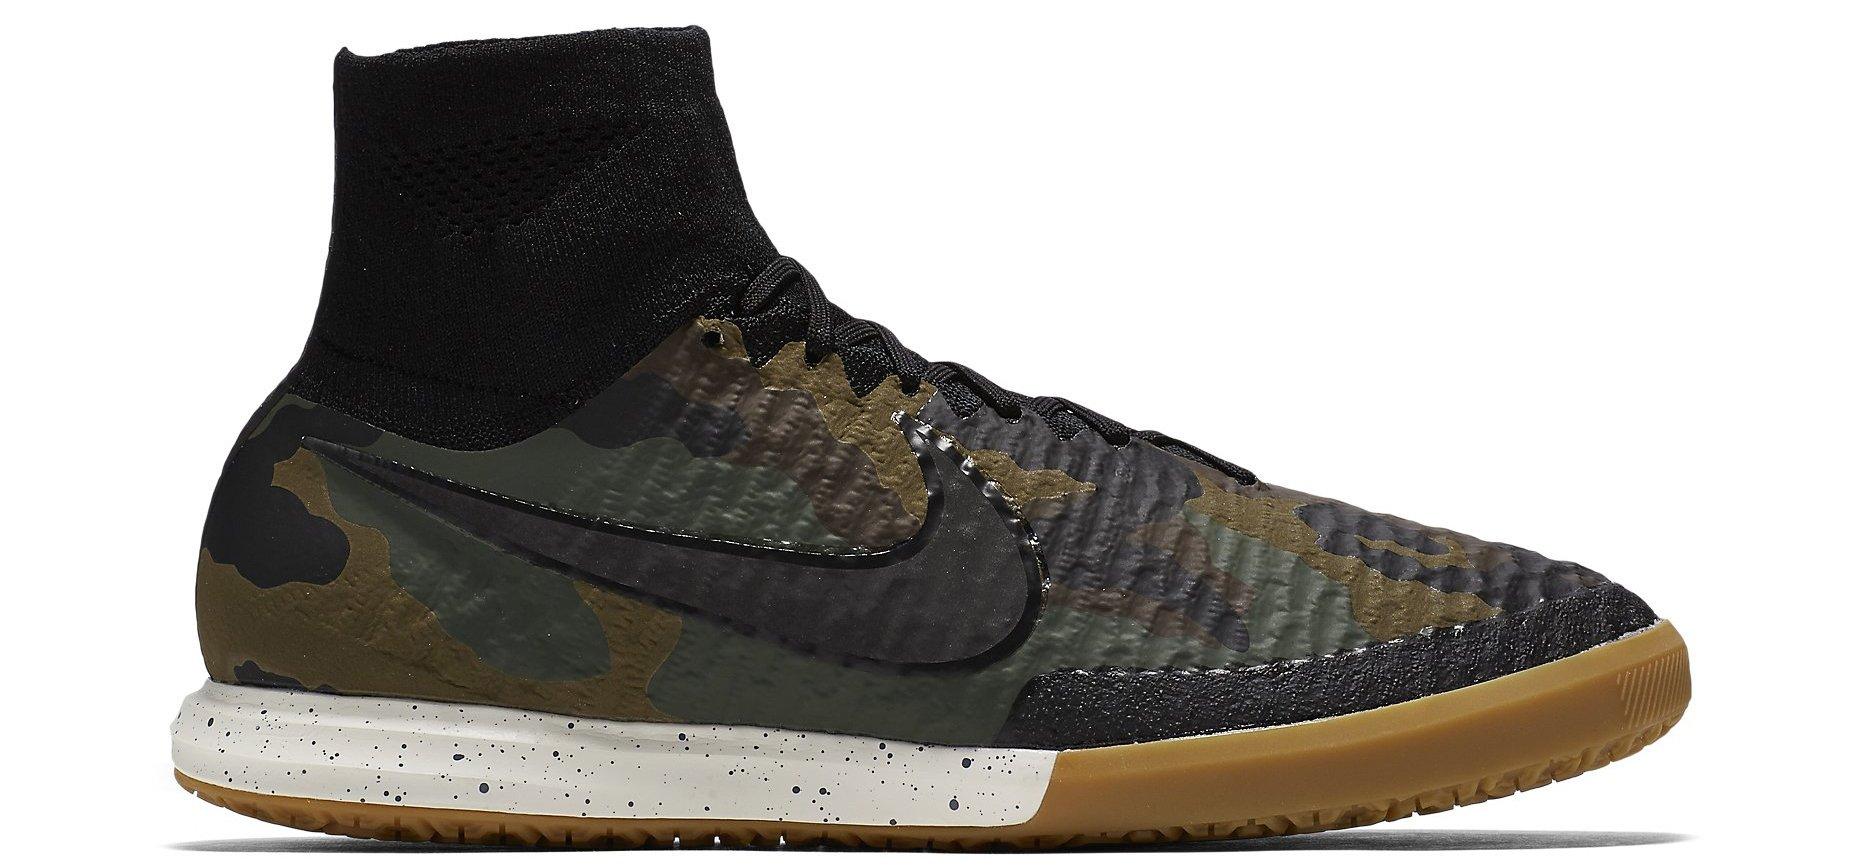 Sálovky Nike MAGISTAX PROXIMO SE IC